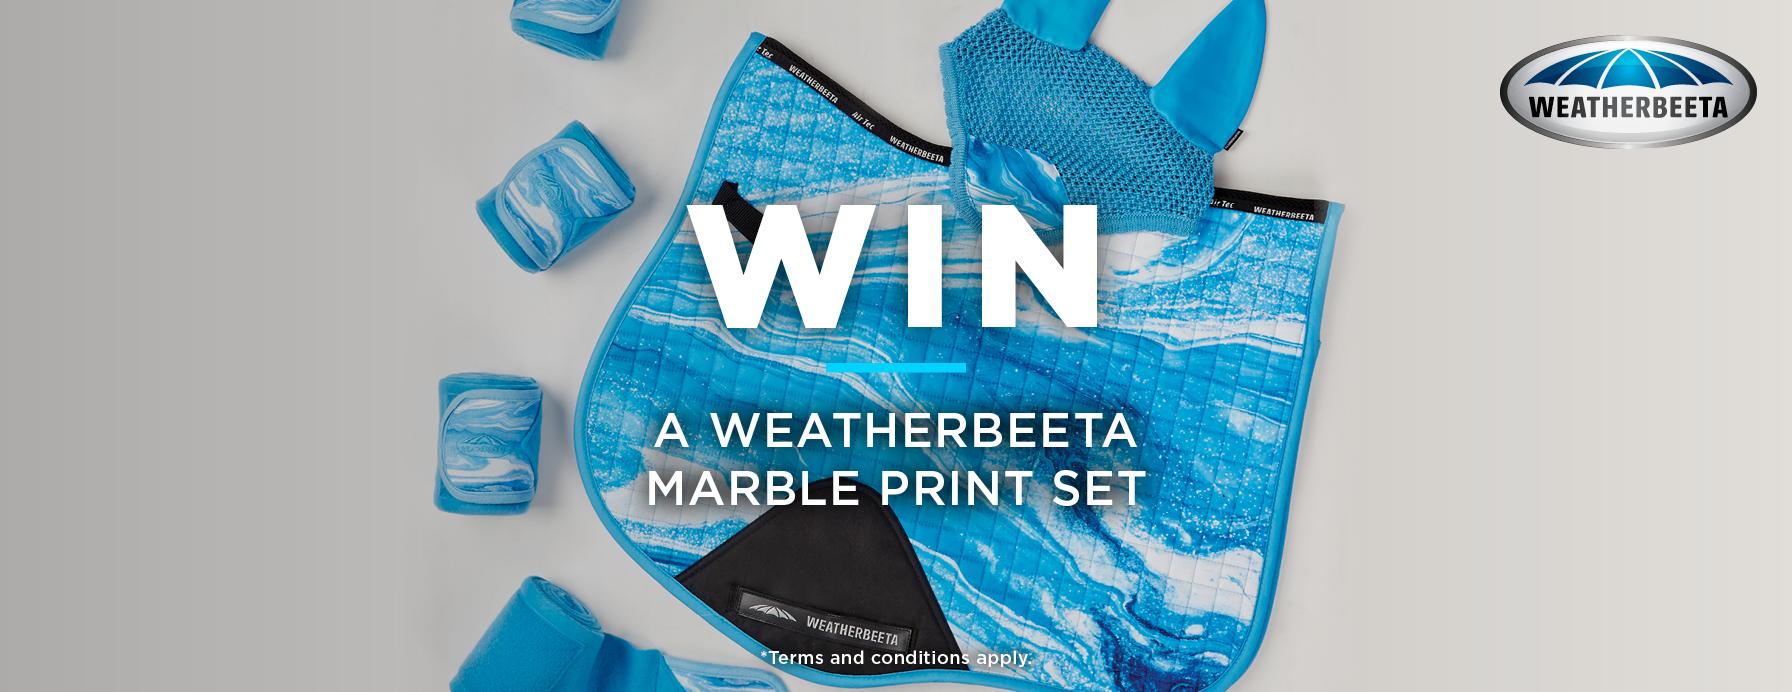 weatherbeeta marble print giveaway